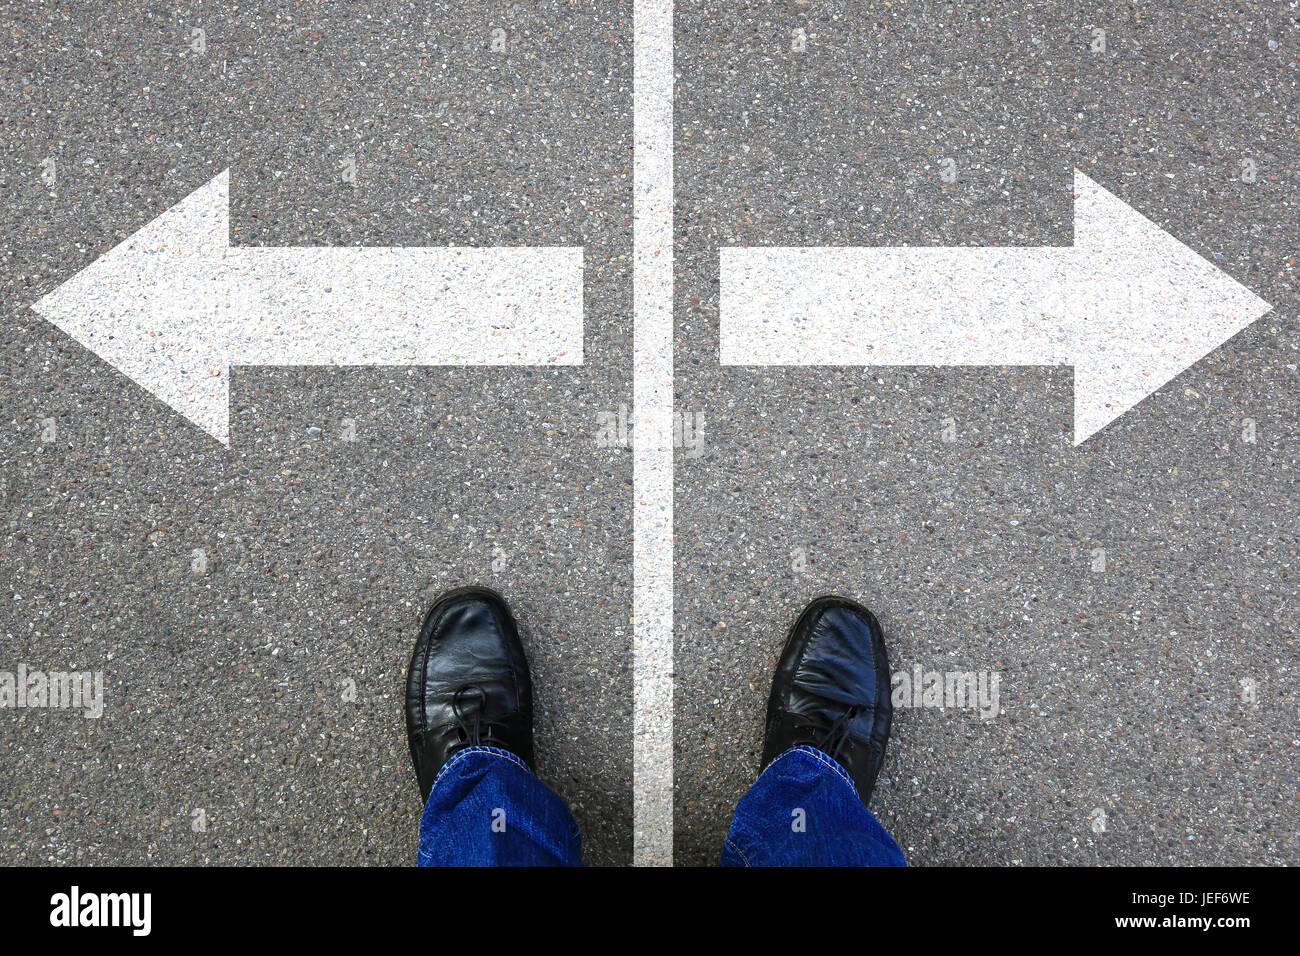 Decisión decidir concepto negocios Empresario de éxito metas trabajo solución elección Imagen De Stock